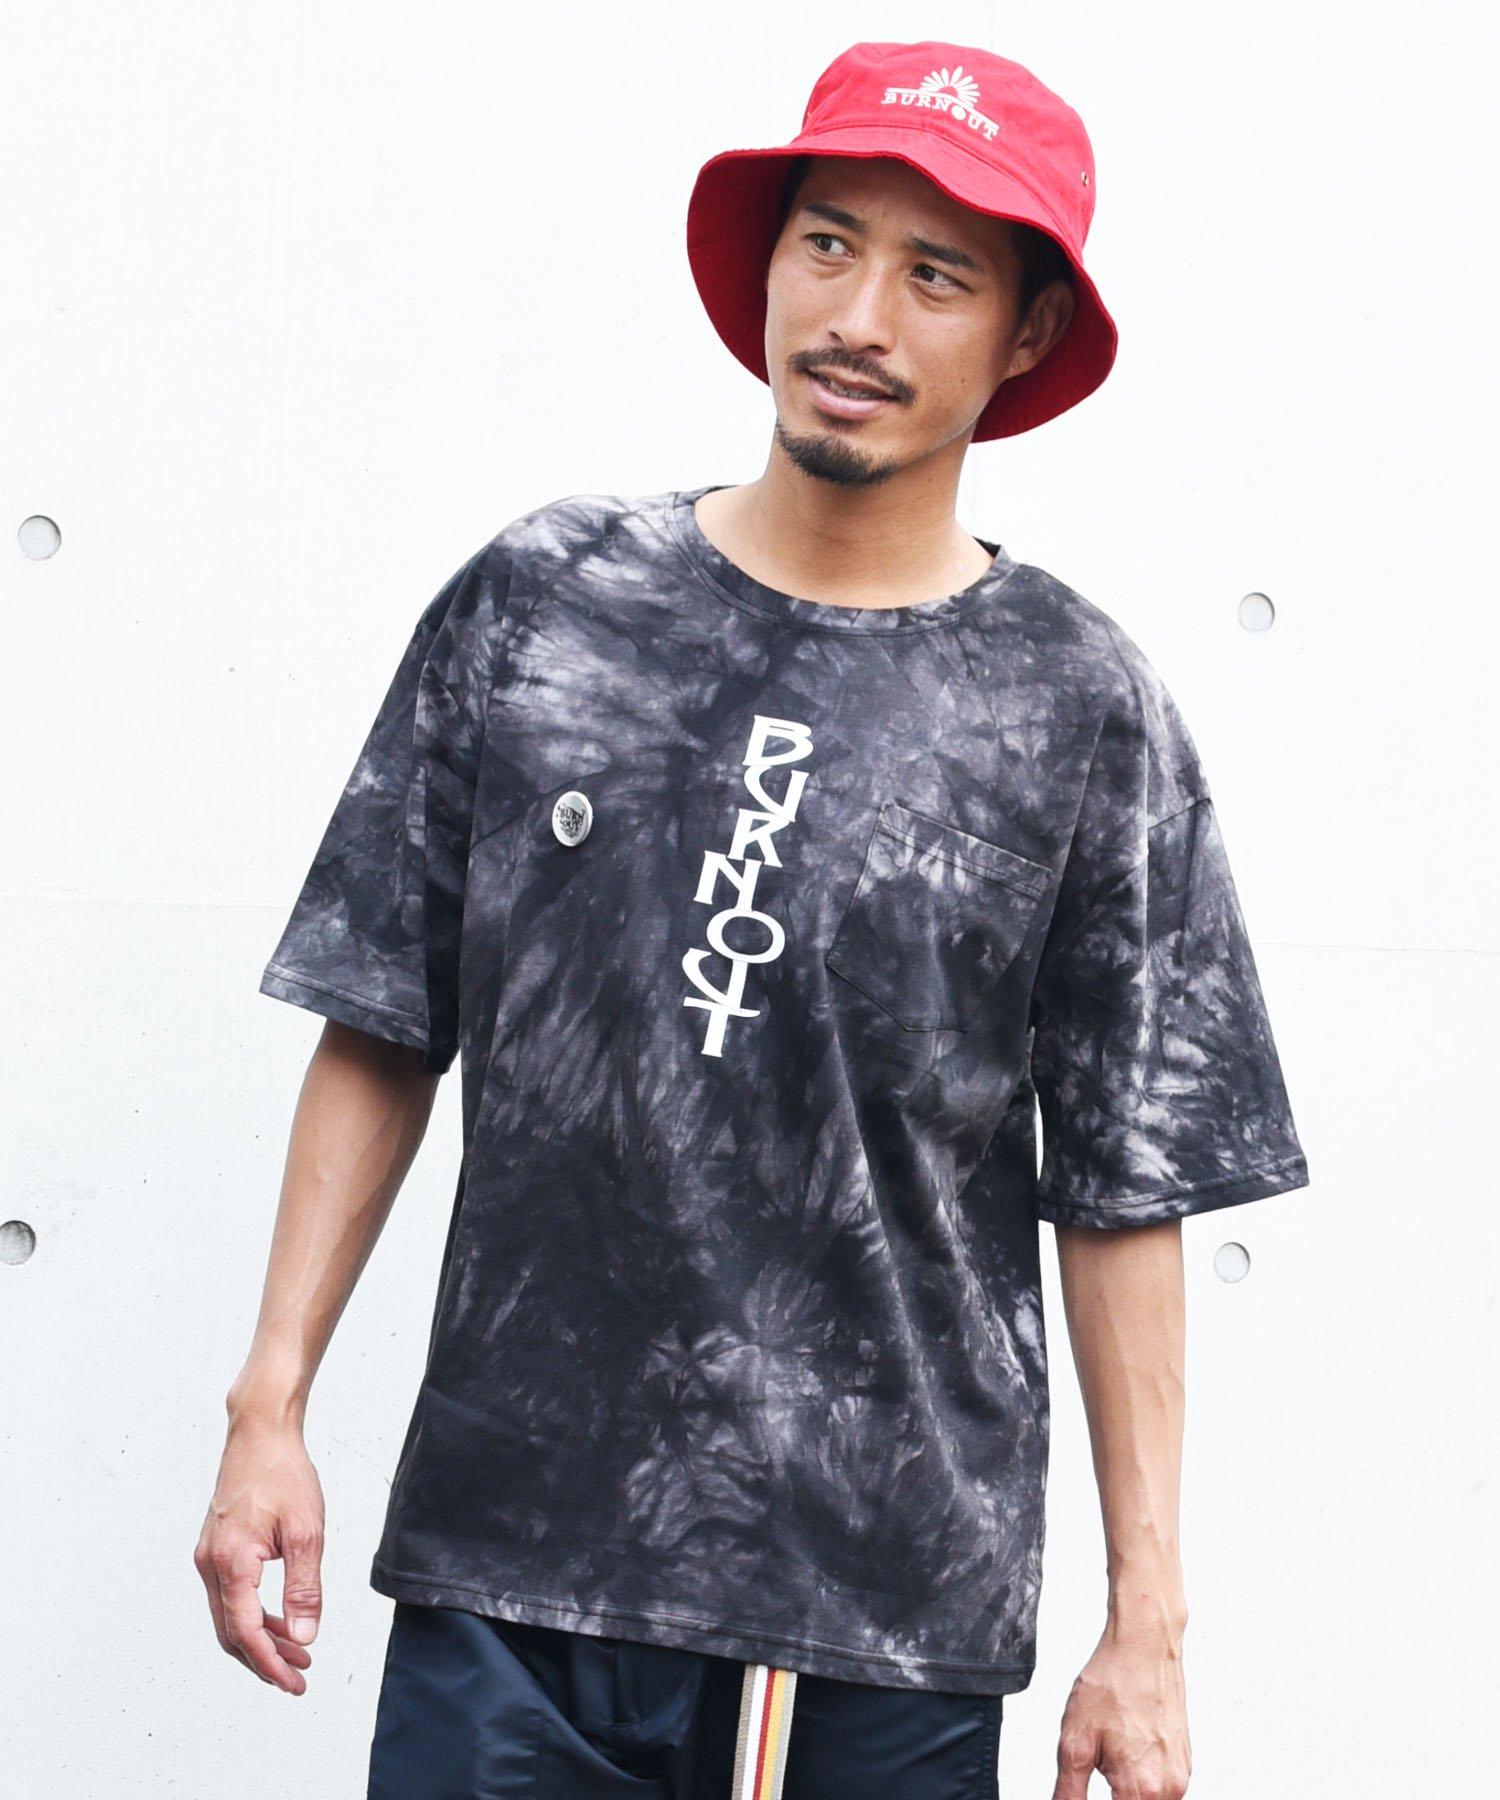 Burnout(バーンアウト )ビッグシルエット tie-dye Tee PK. Burnout print T-shirts (缶バッジ付き)/ブラック